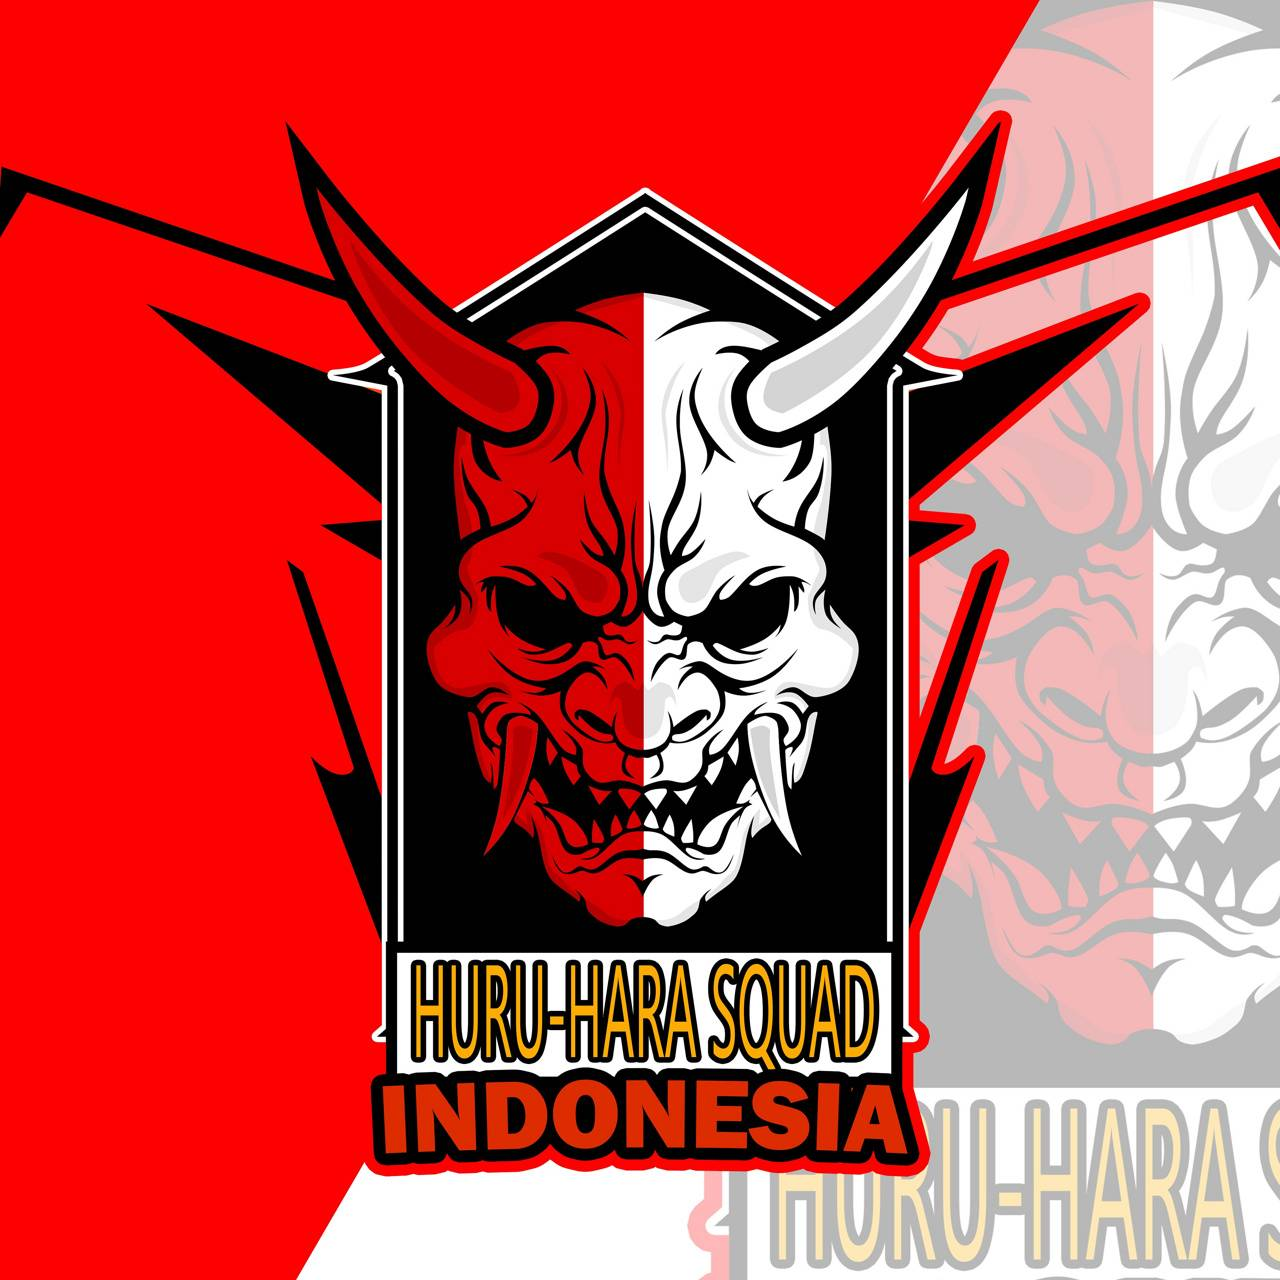 Huru Hara Squad